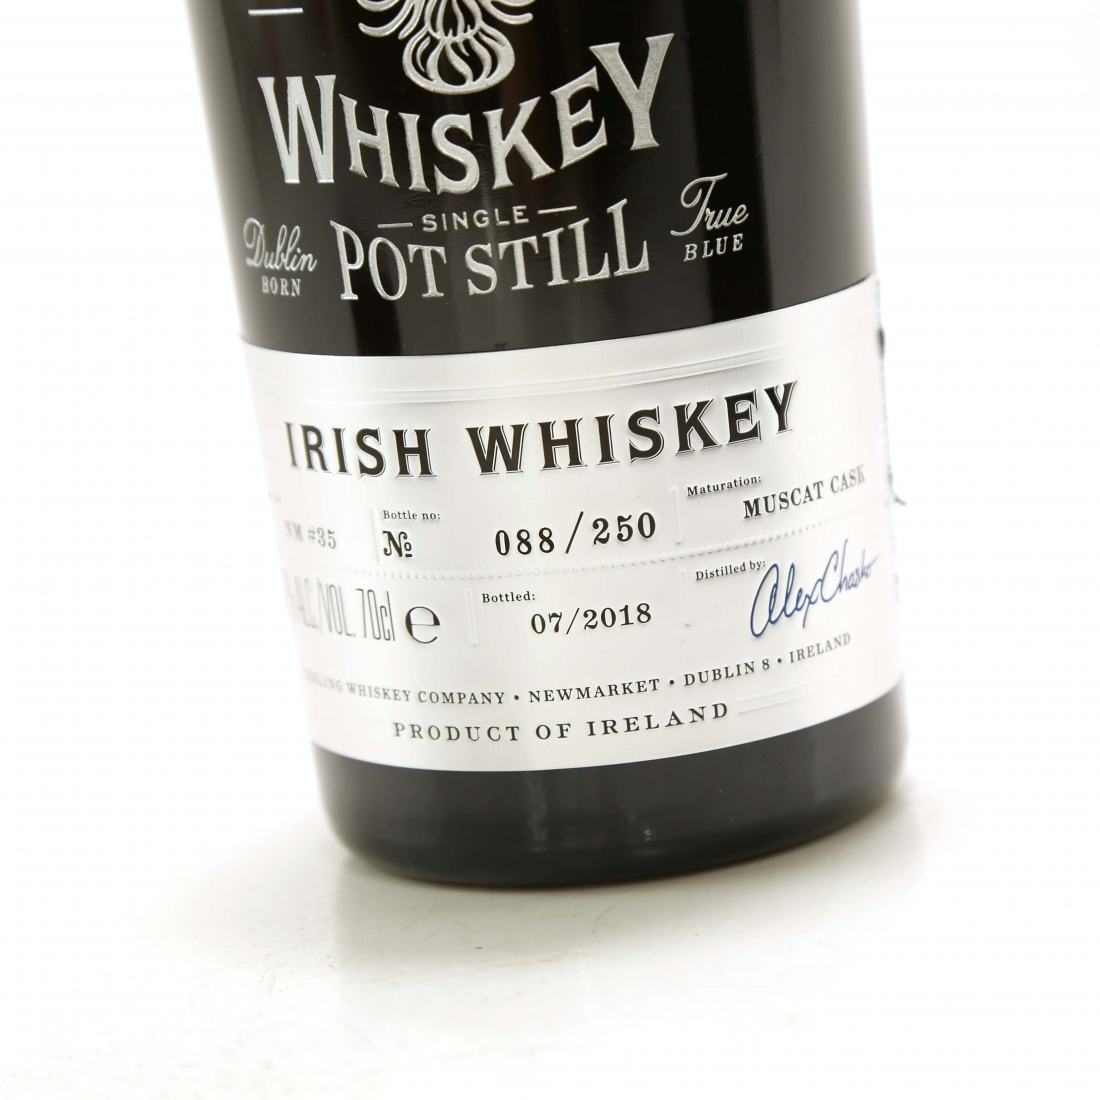 Teeling Celebratory Single Pot Still Whiskey / Bottle #088